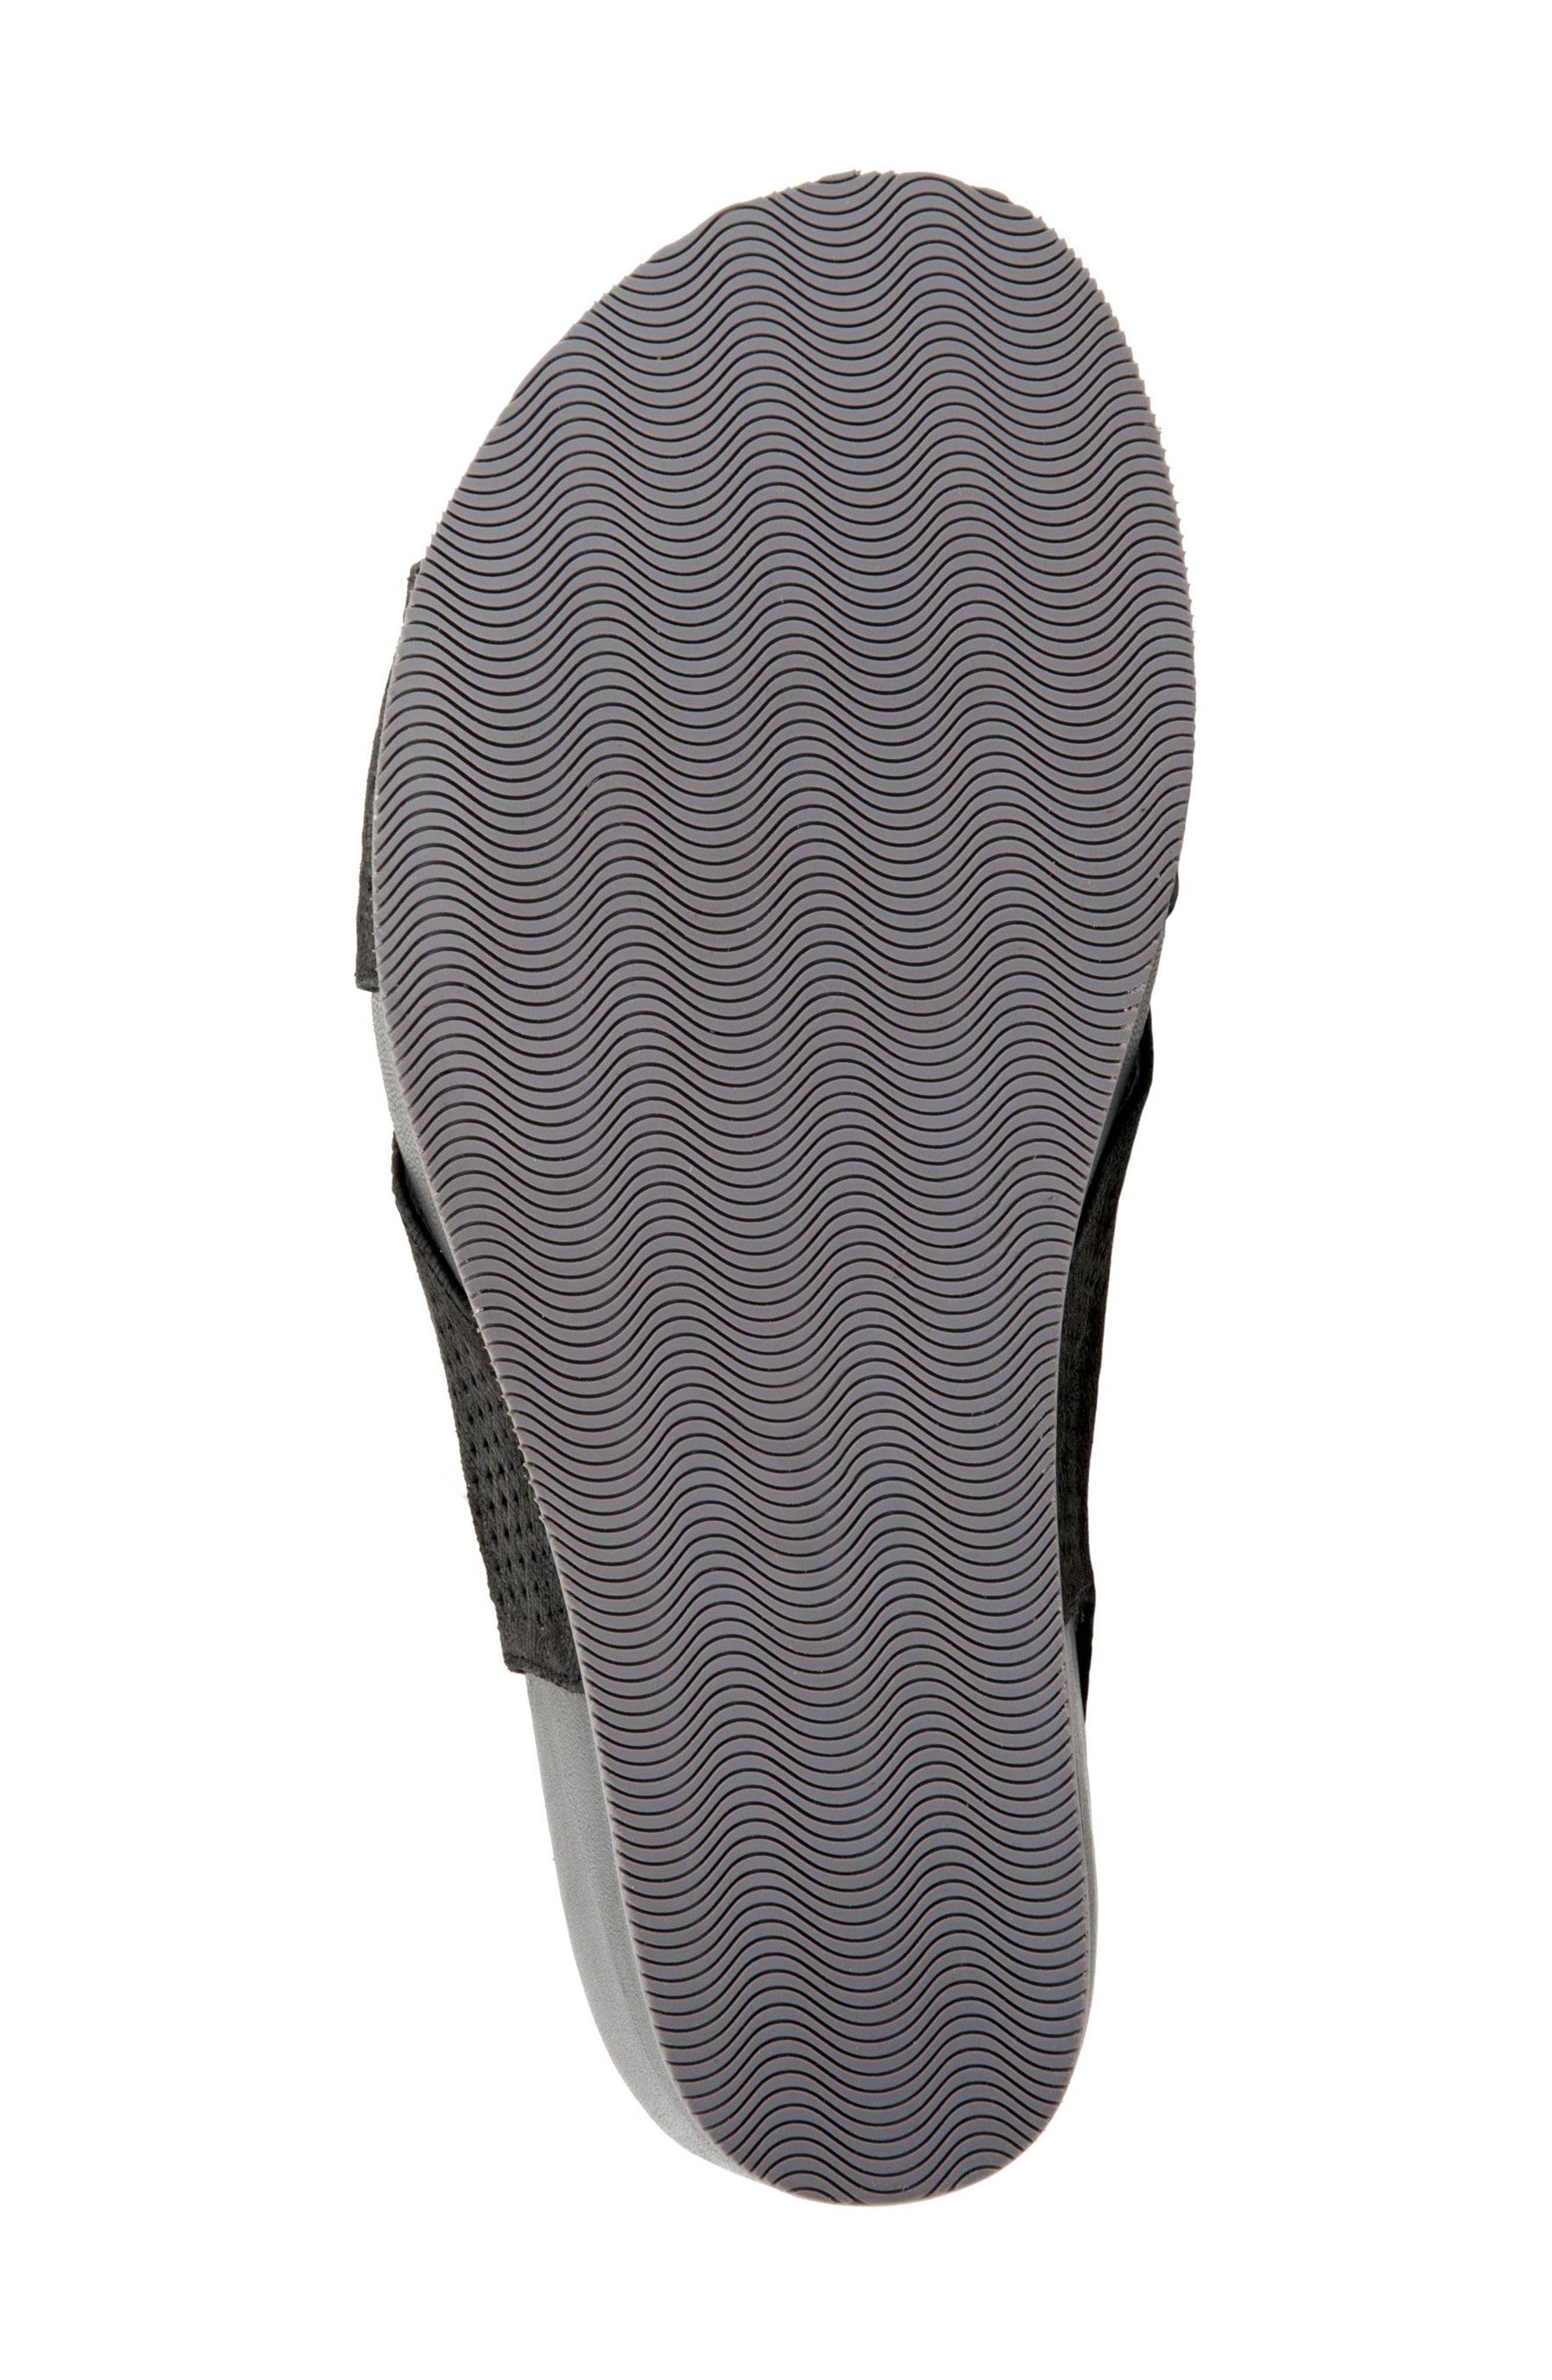 Hansford Wedge Sandal,                             Alternate thumbnail 4, color,                             Black Nubuck Leather